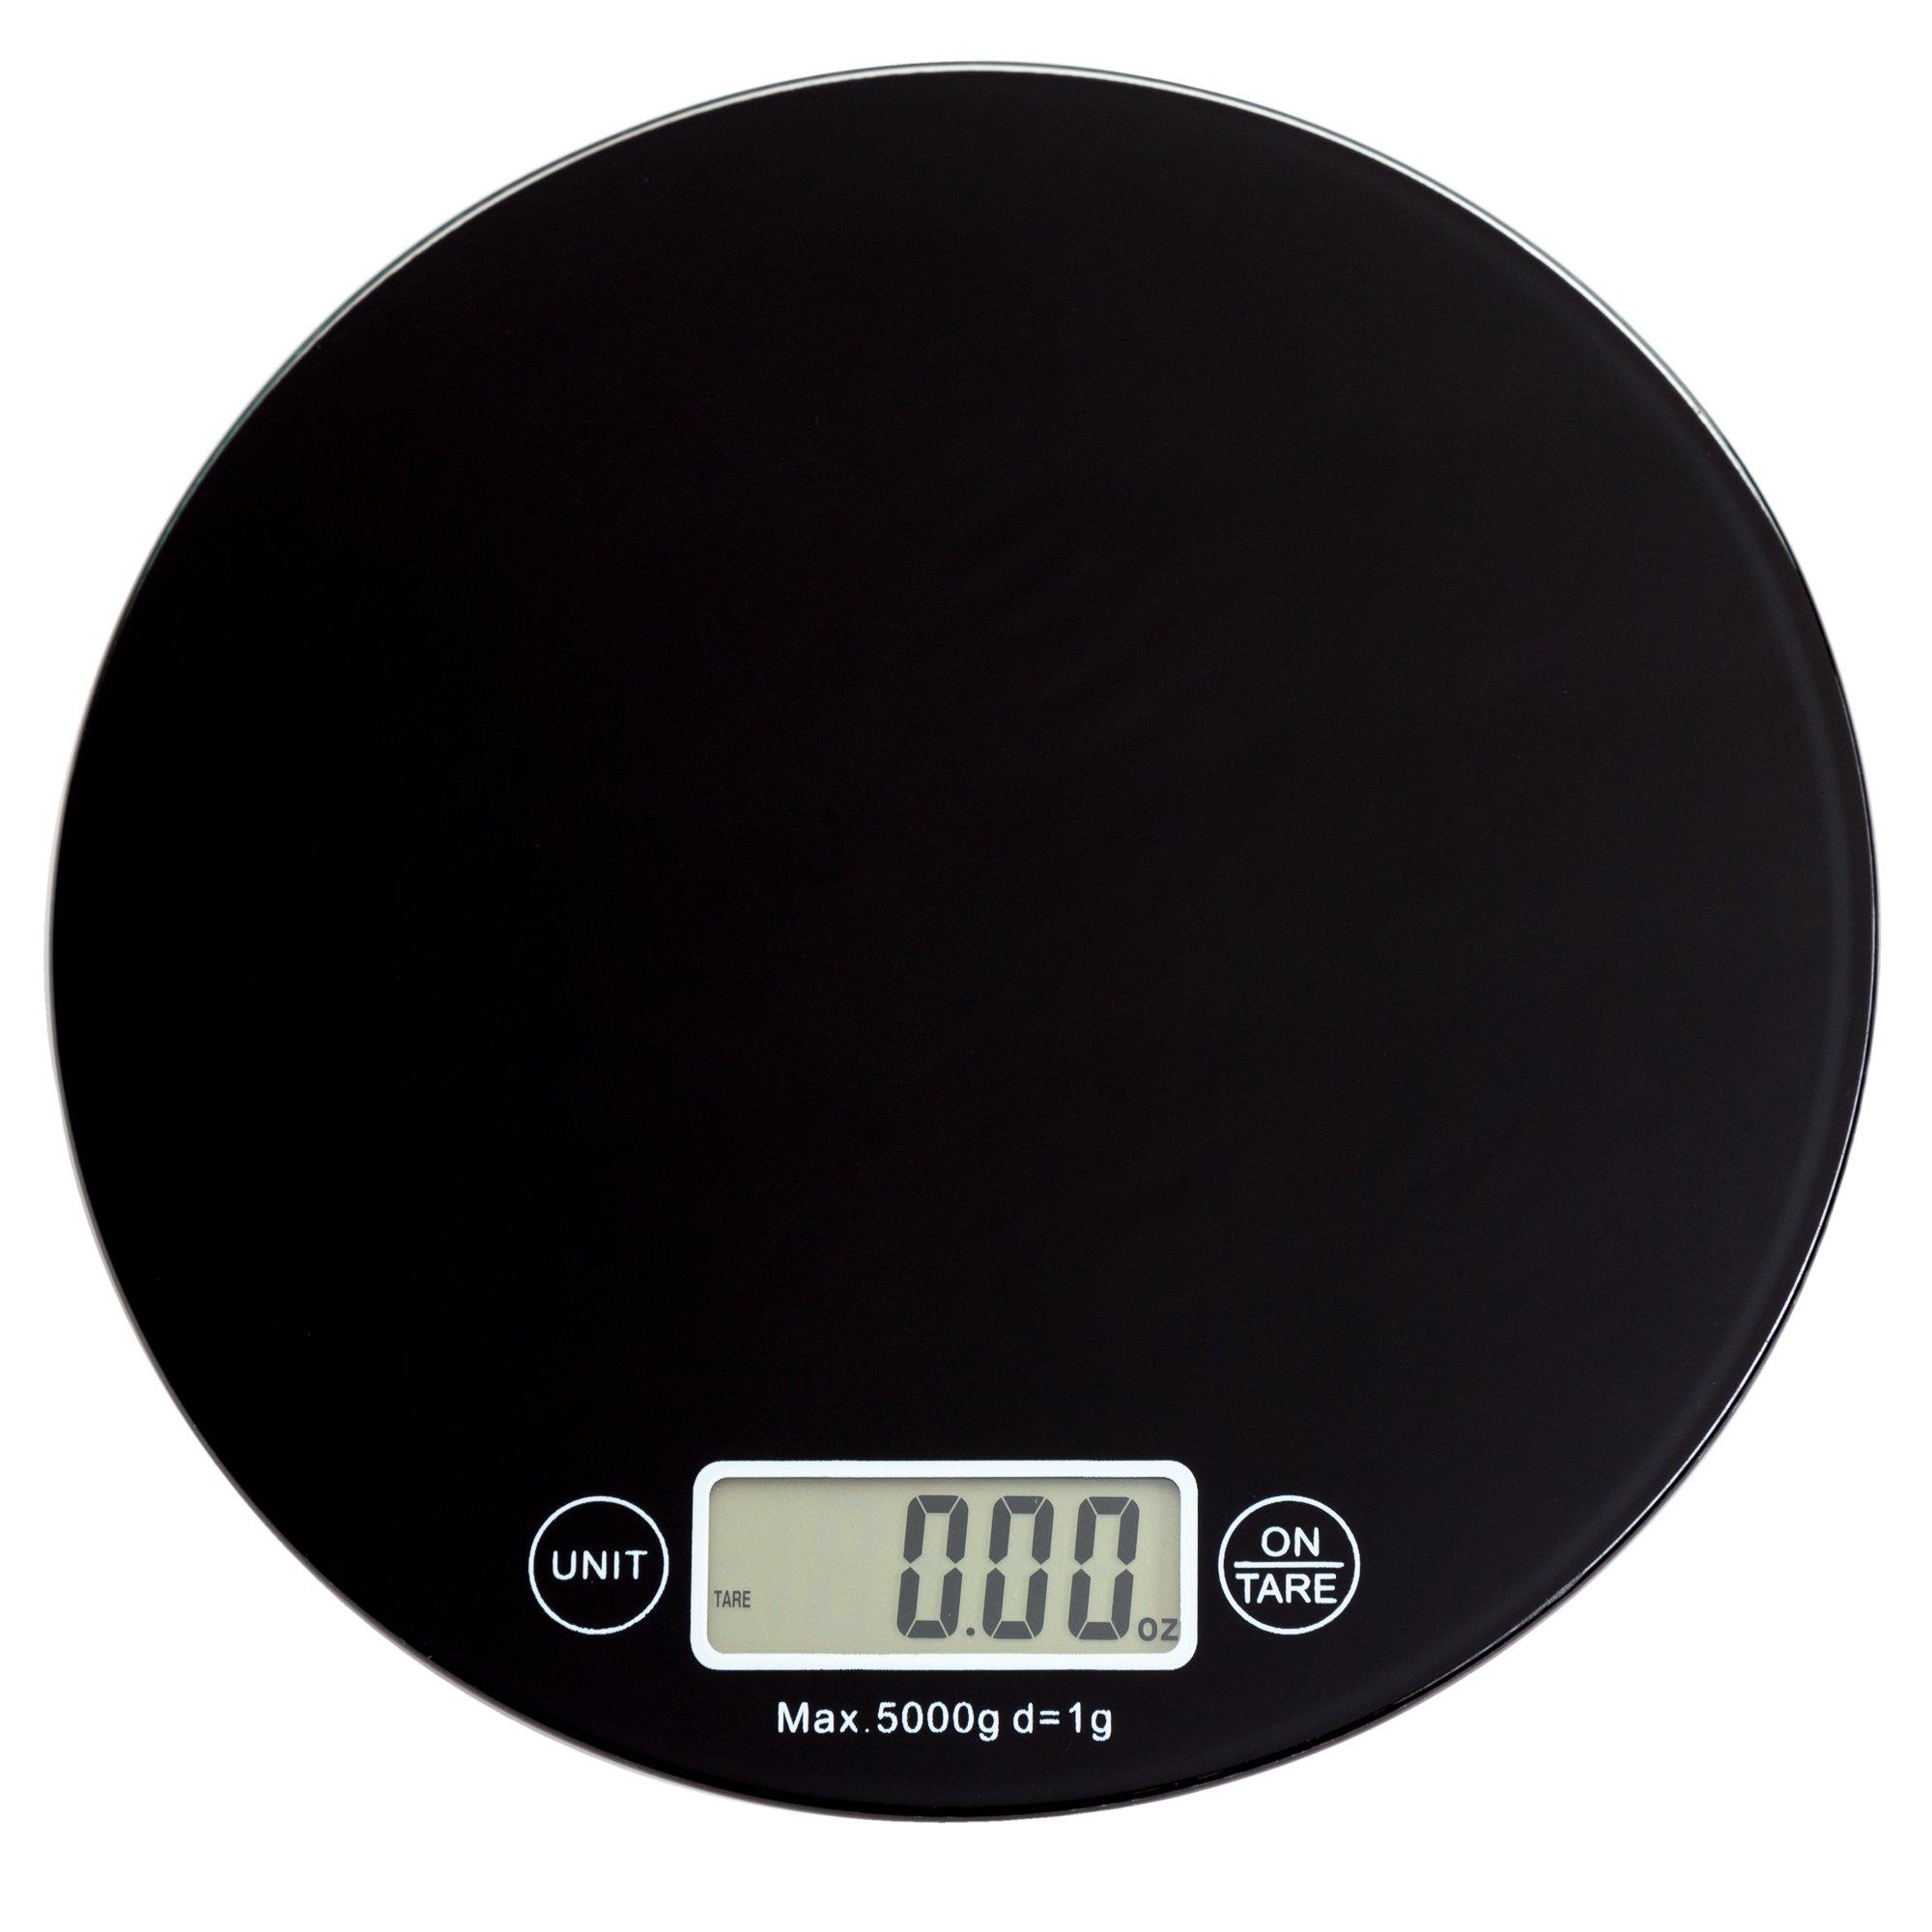 Digital Multifunction Kitchen and Food Scale, Elegant Black